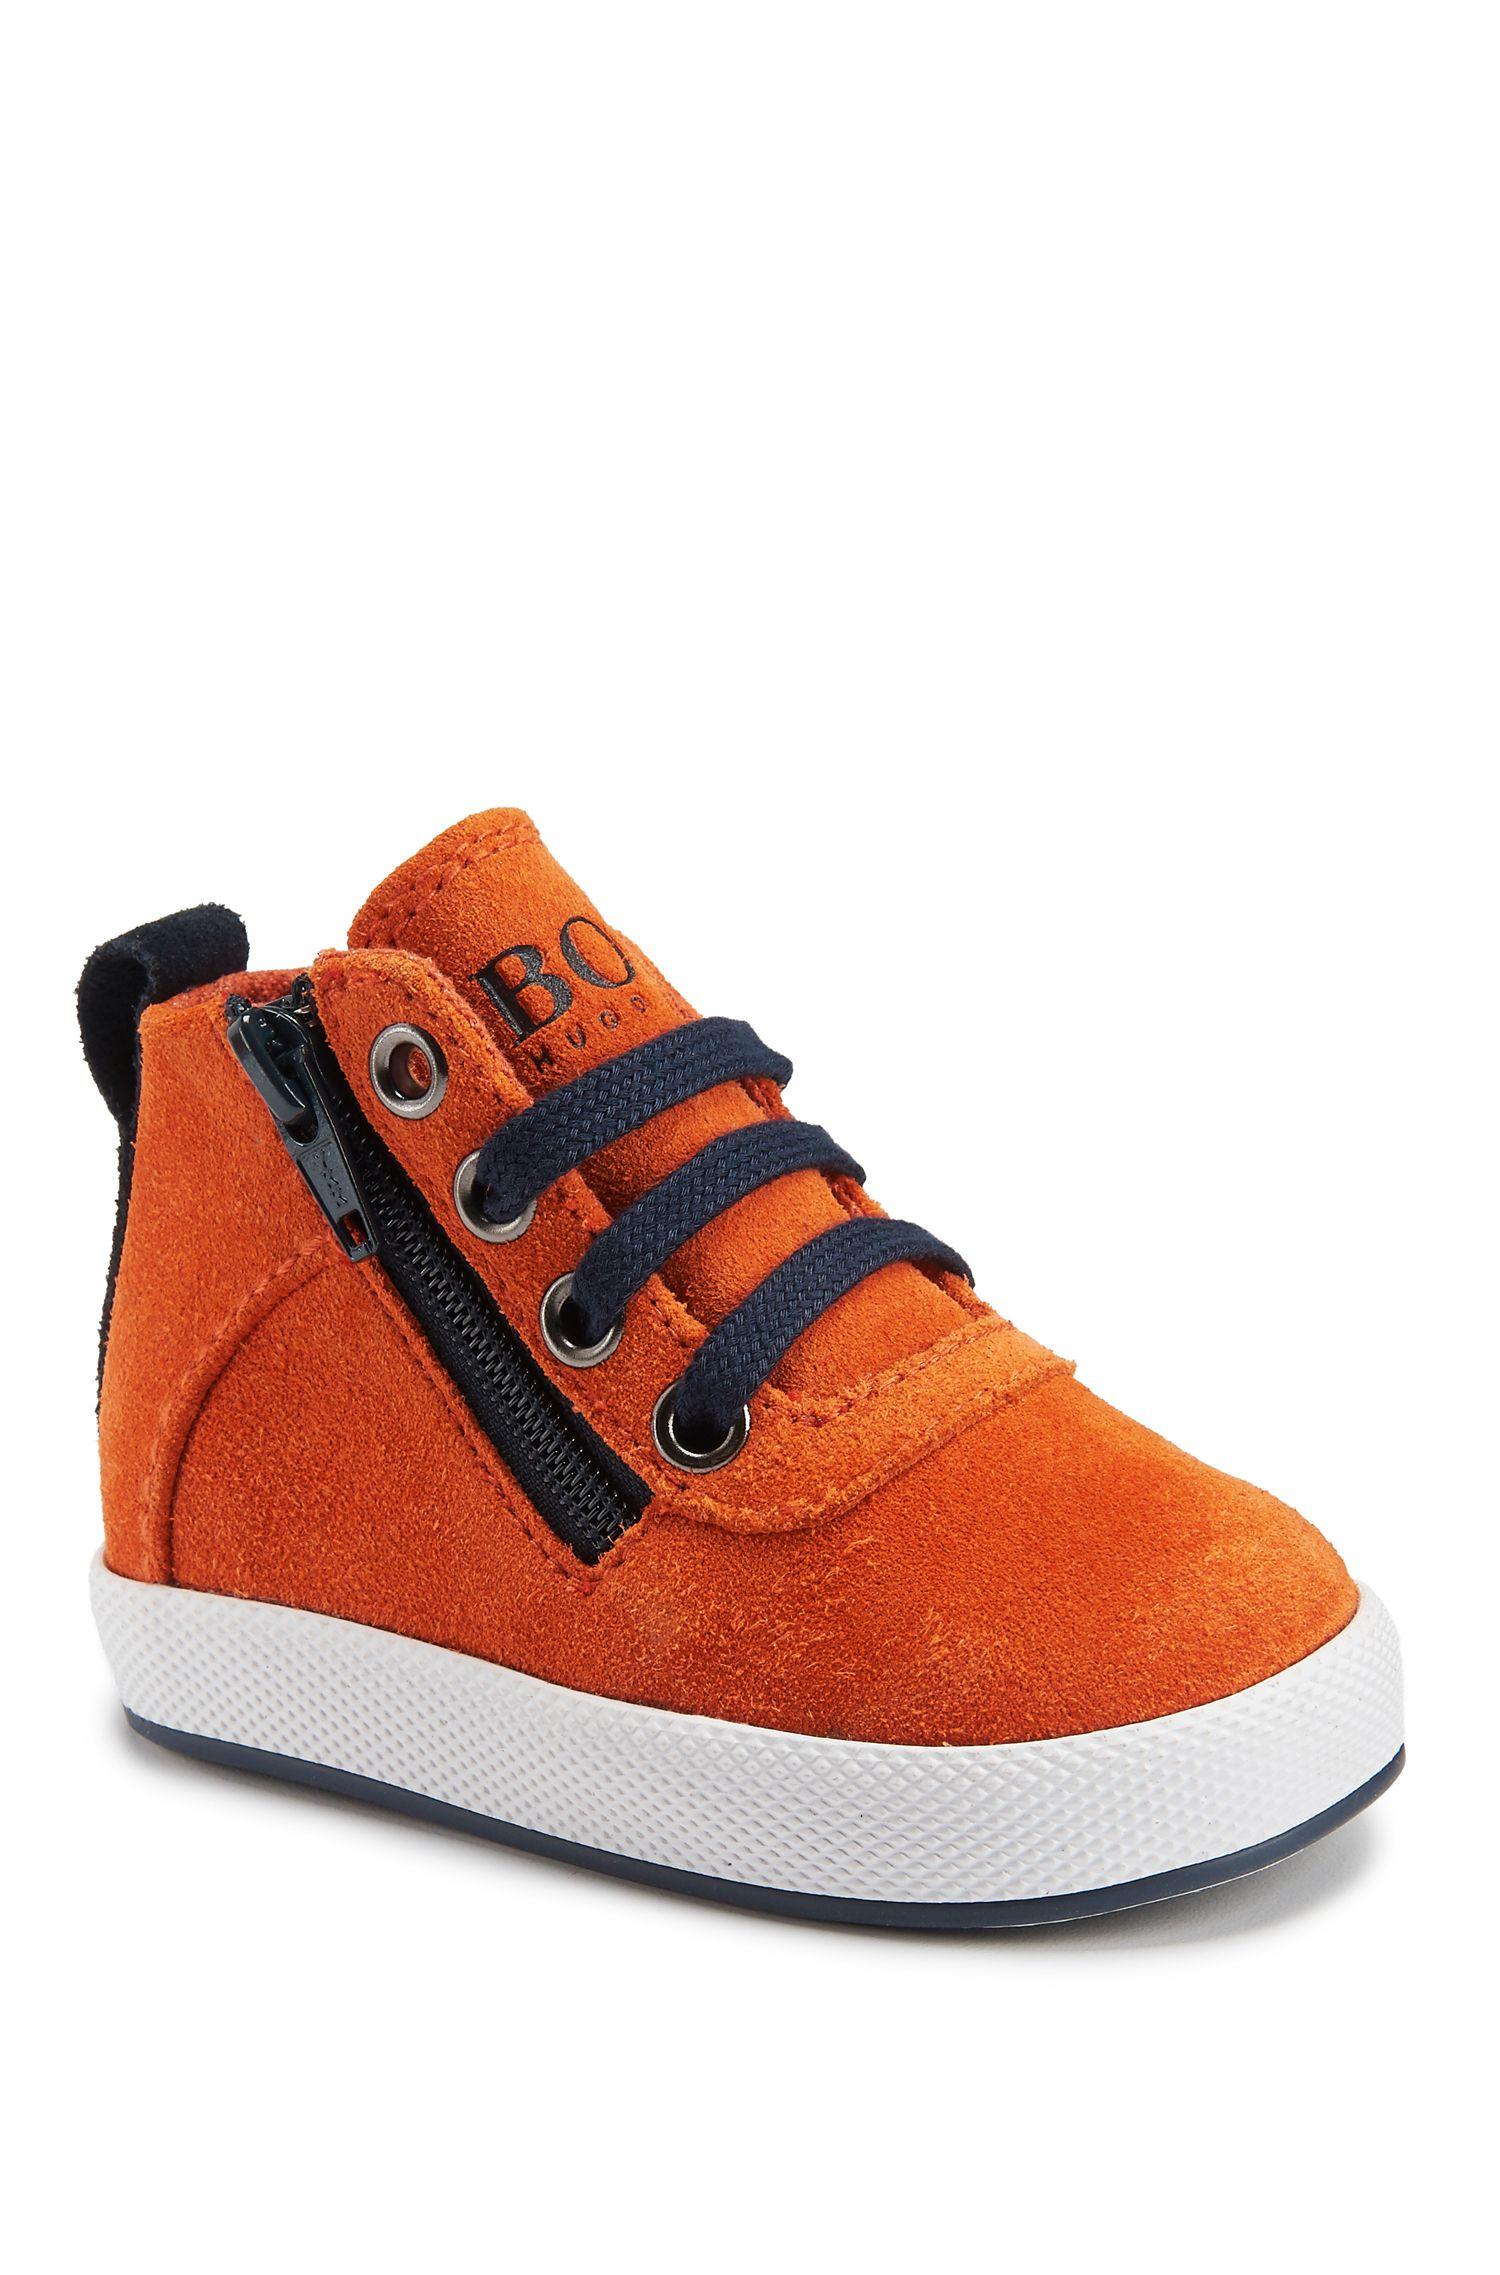 Newborn Suede Sneaker | J09084